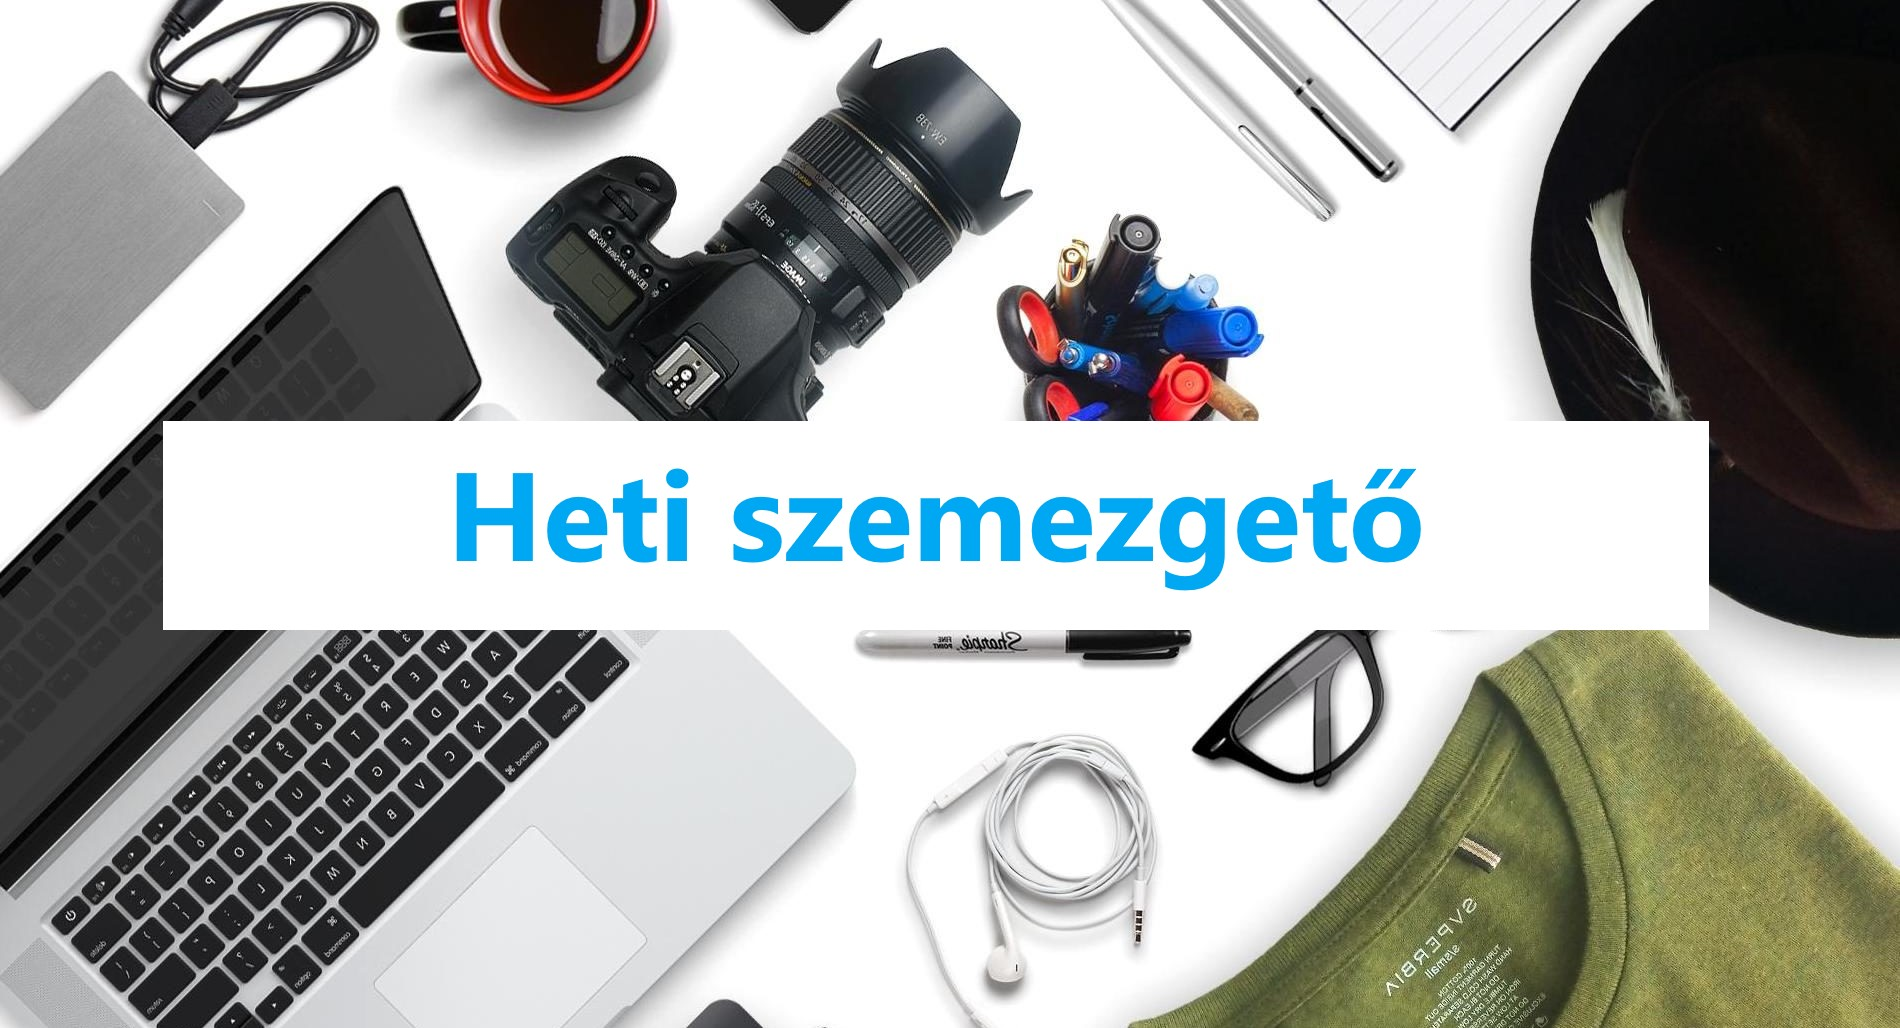 heti_szemezgeto_uj_44.jpg